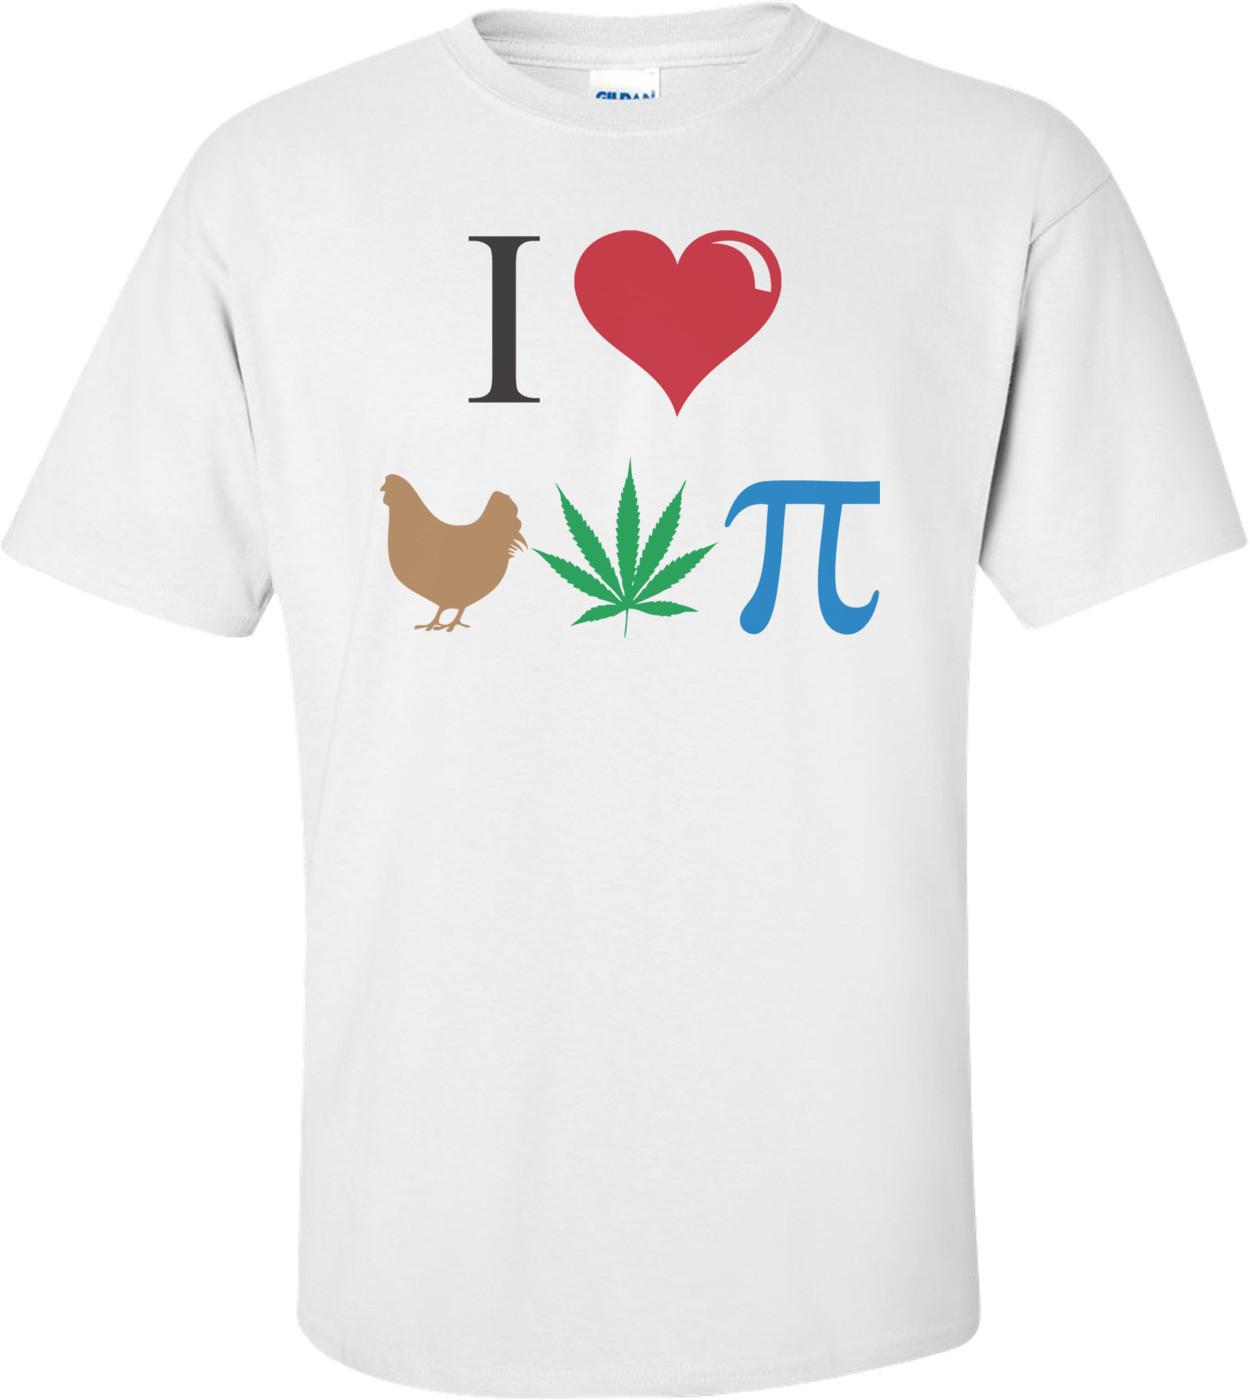 I Love Chicken Pot Pie Funny T-shirt